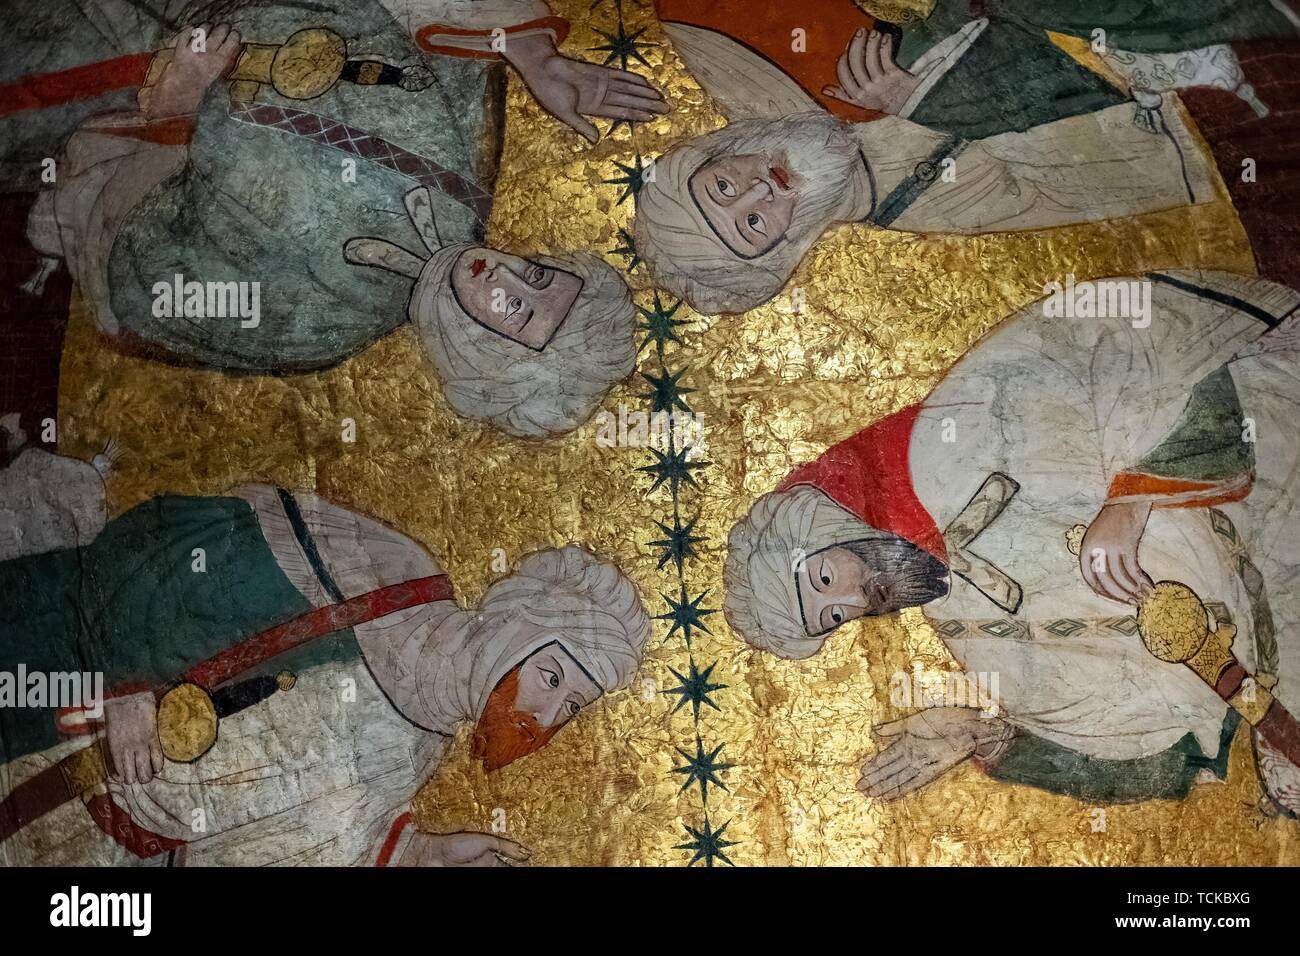 Meeting of Islamic dignitaries, ceiling painting, Sala de los Reyes, Room of the Kings, Nasrid palaces, Alhambra, Granada, Andalusia, Spain - Stock Image